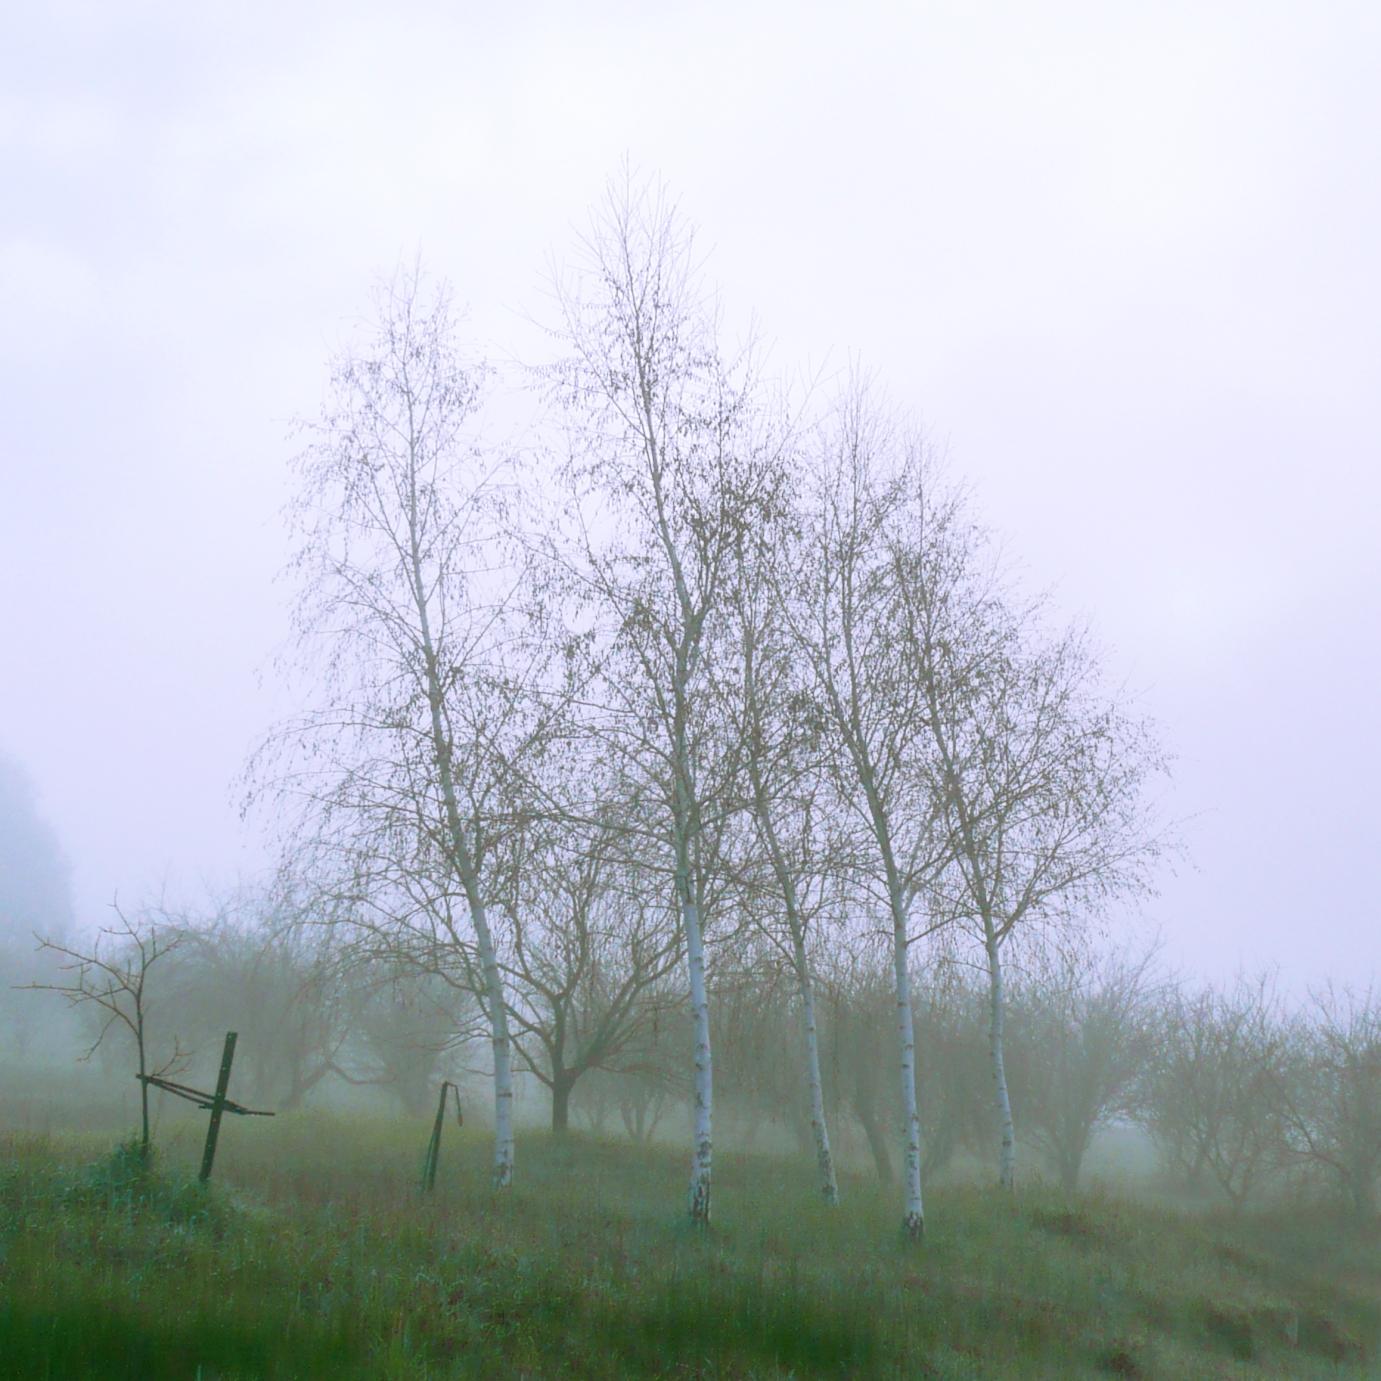 Balingup trees, 20.07.08